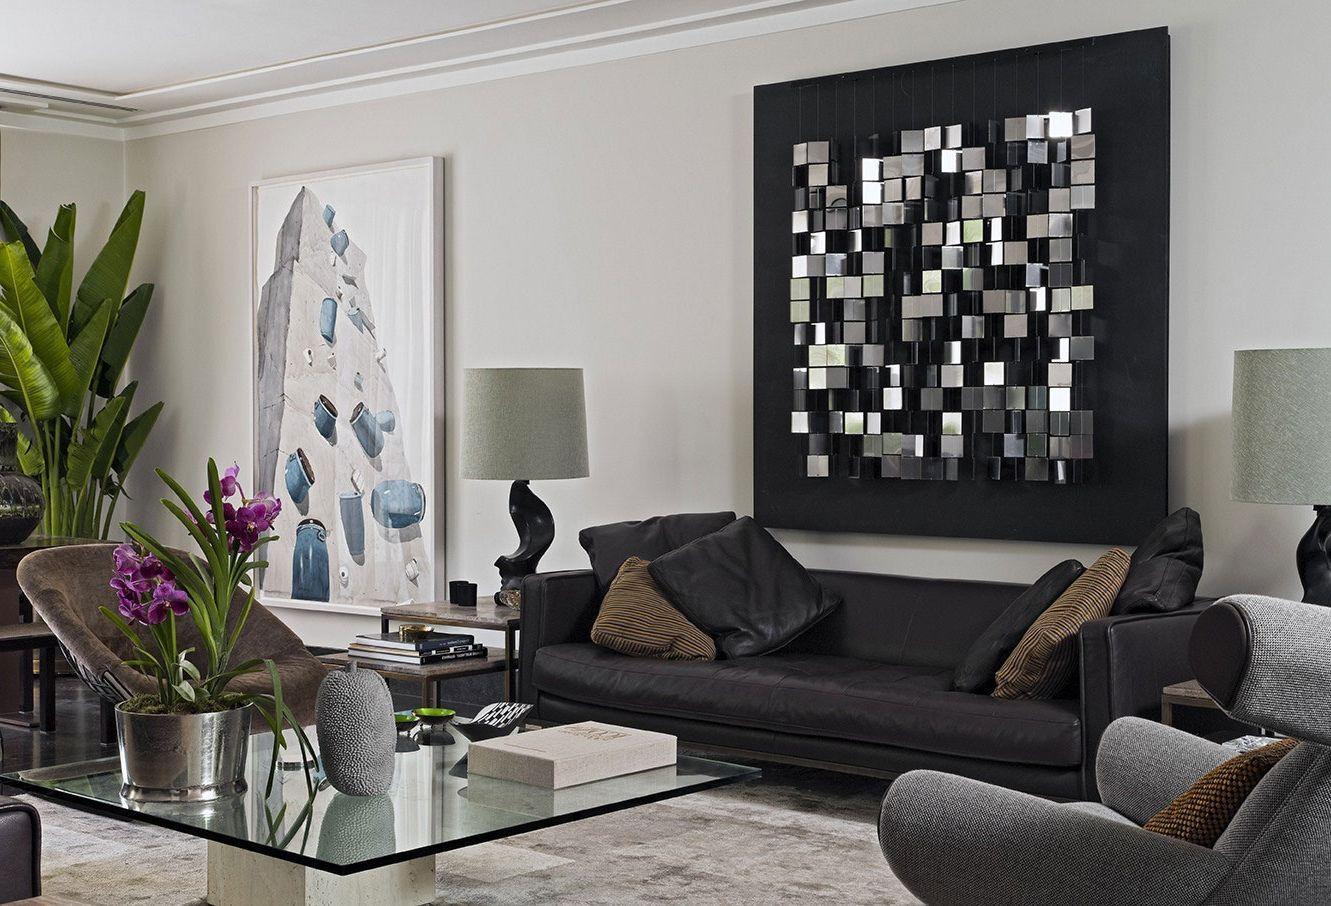 Modern Wall Art For Living Room Simple Diy Wall Art On Oversized For Oversized Modern Wall Art (View 7 of 20)